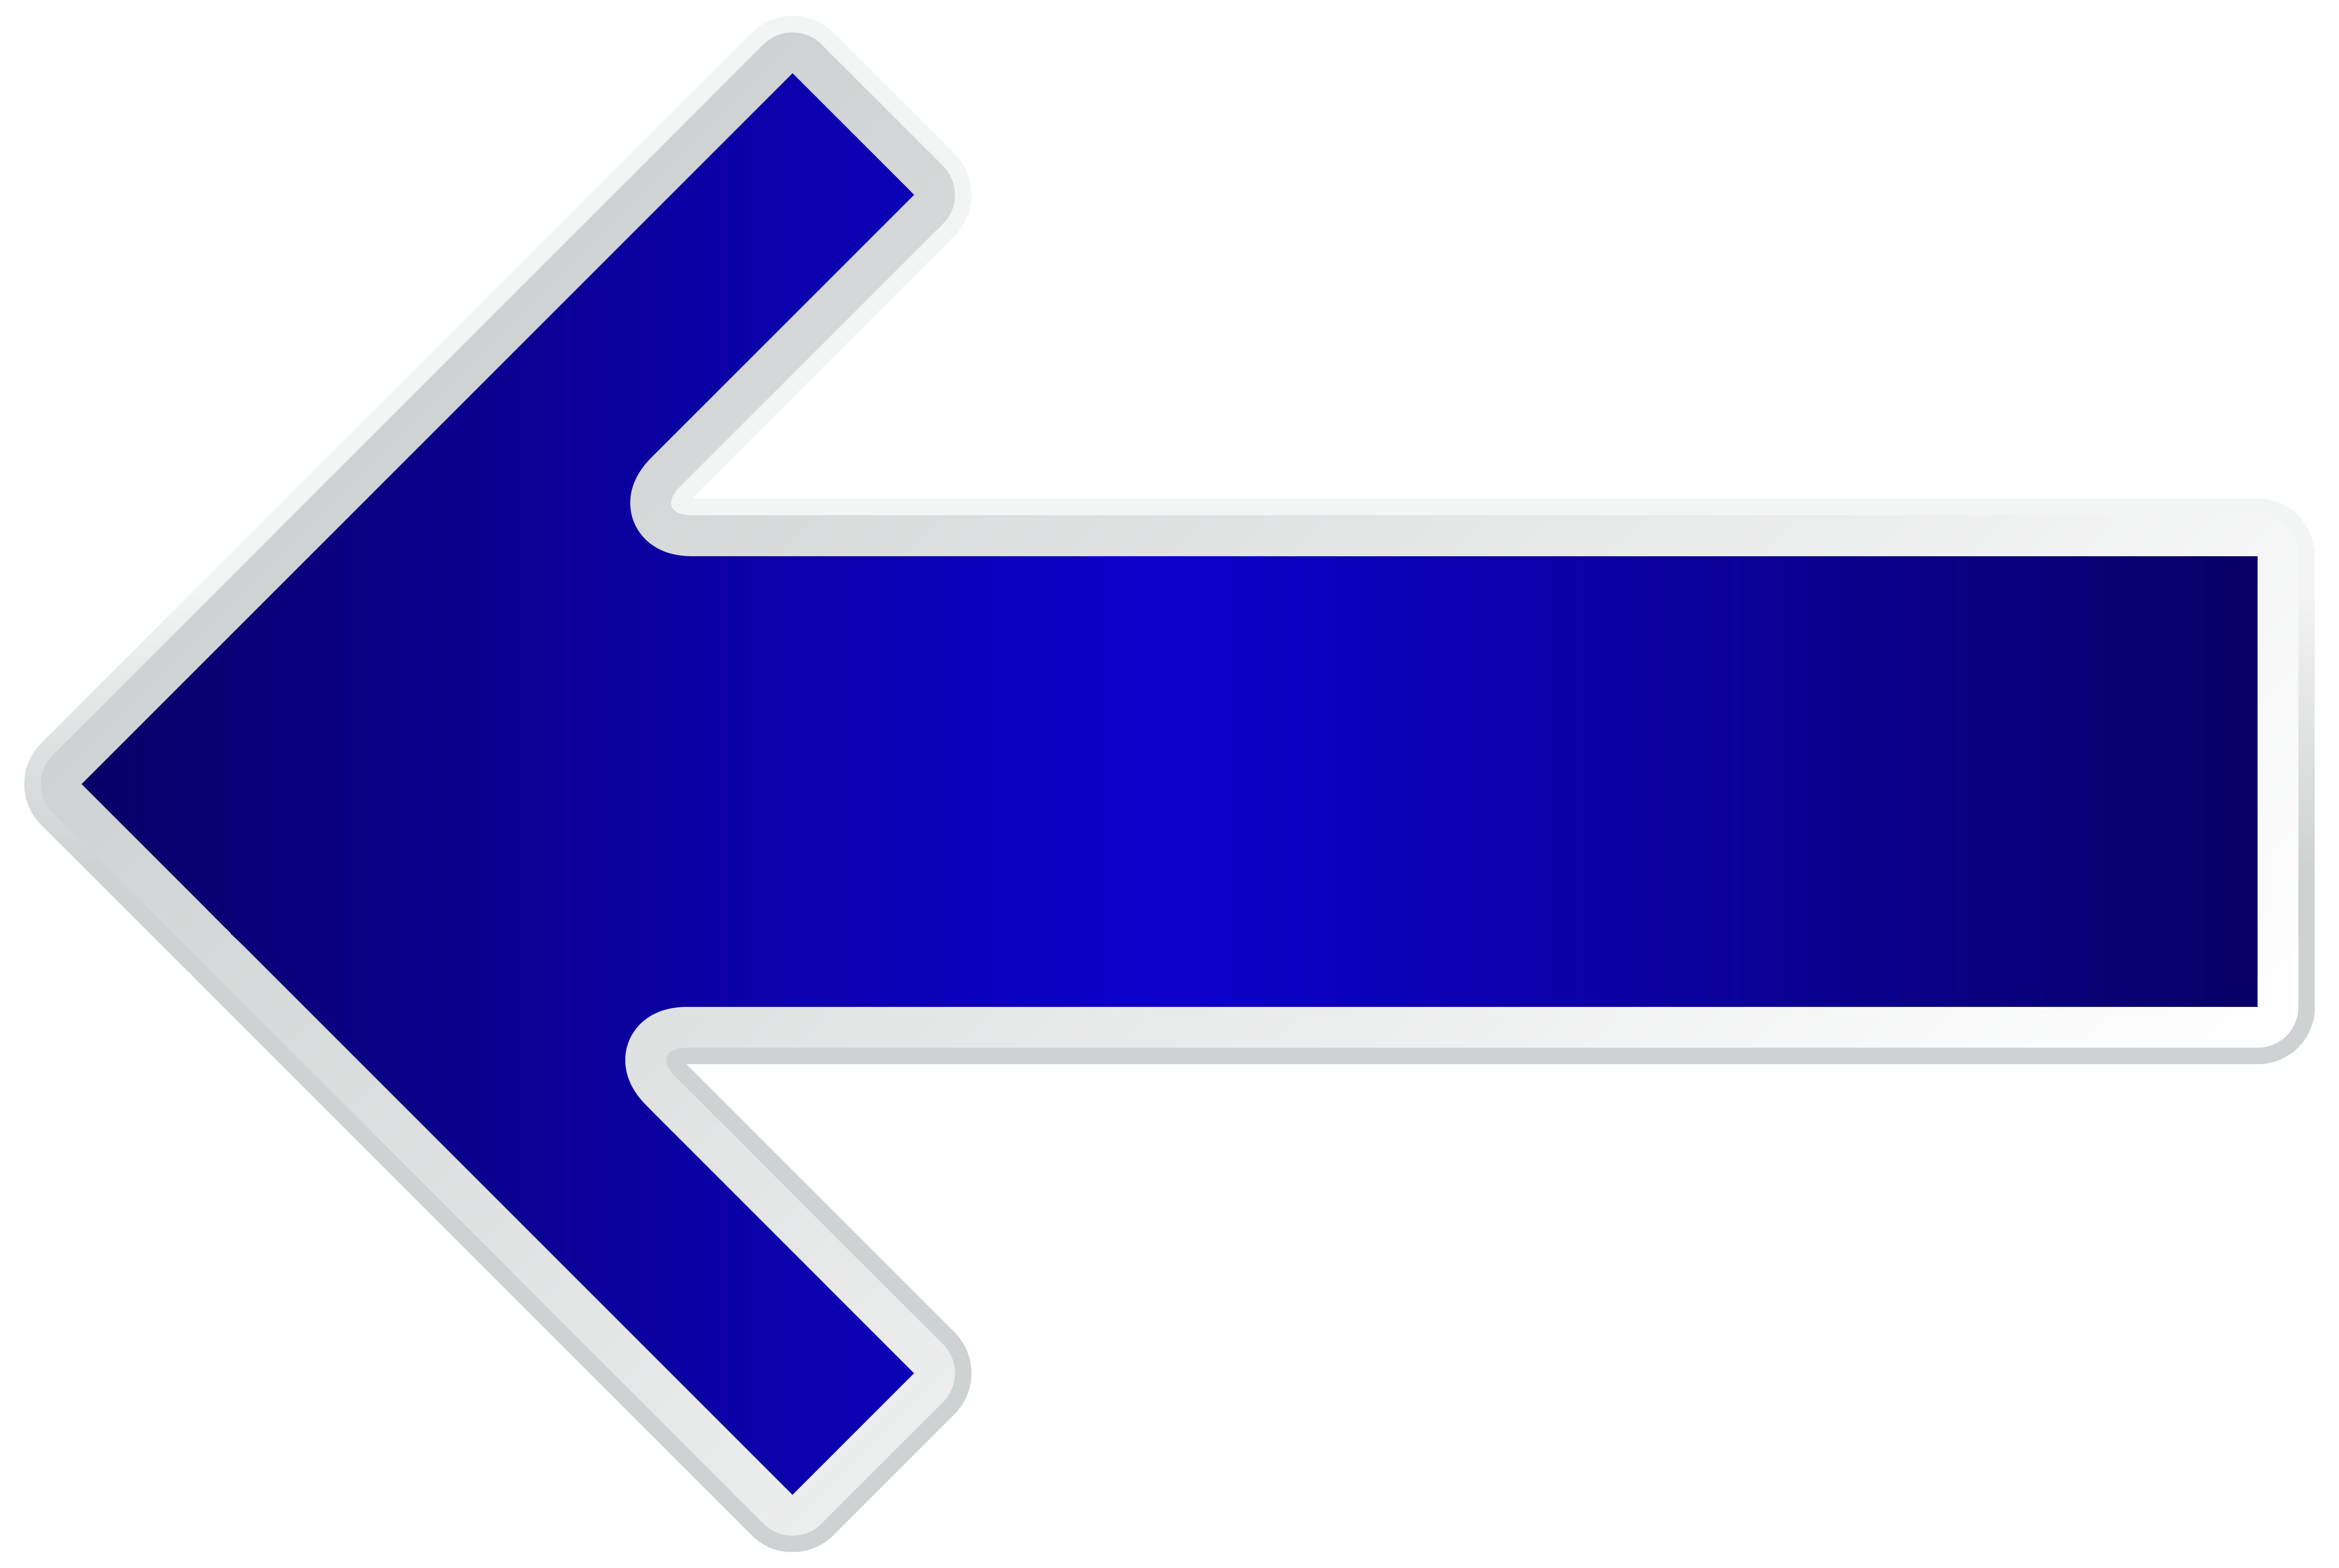 Free clipart left arrow vector library library Arrow Blue Left Transparent PNG Clip Art Image vector library library